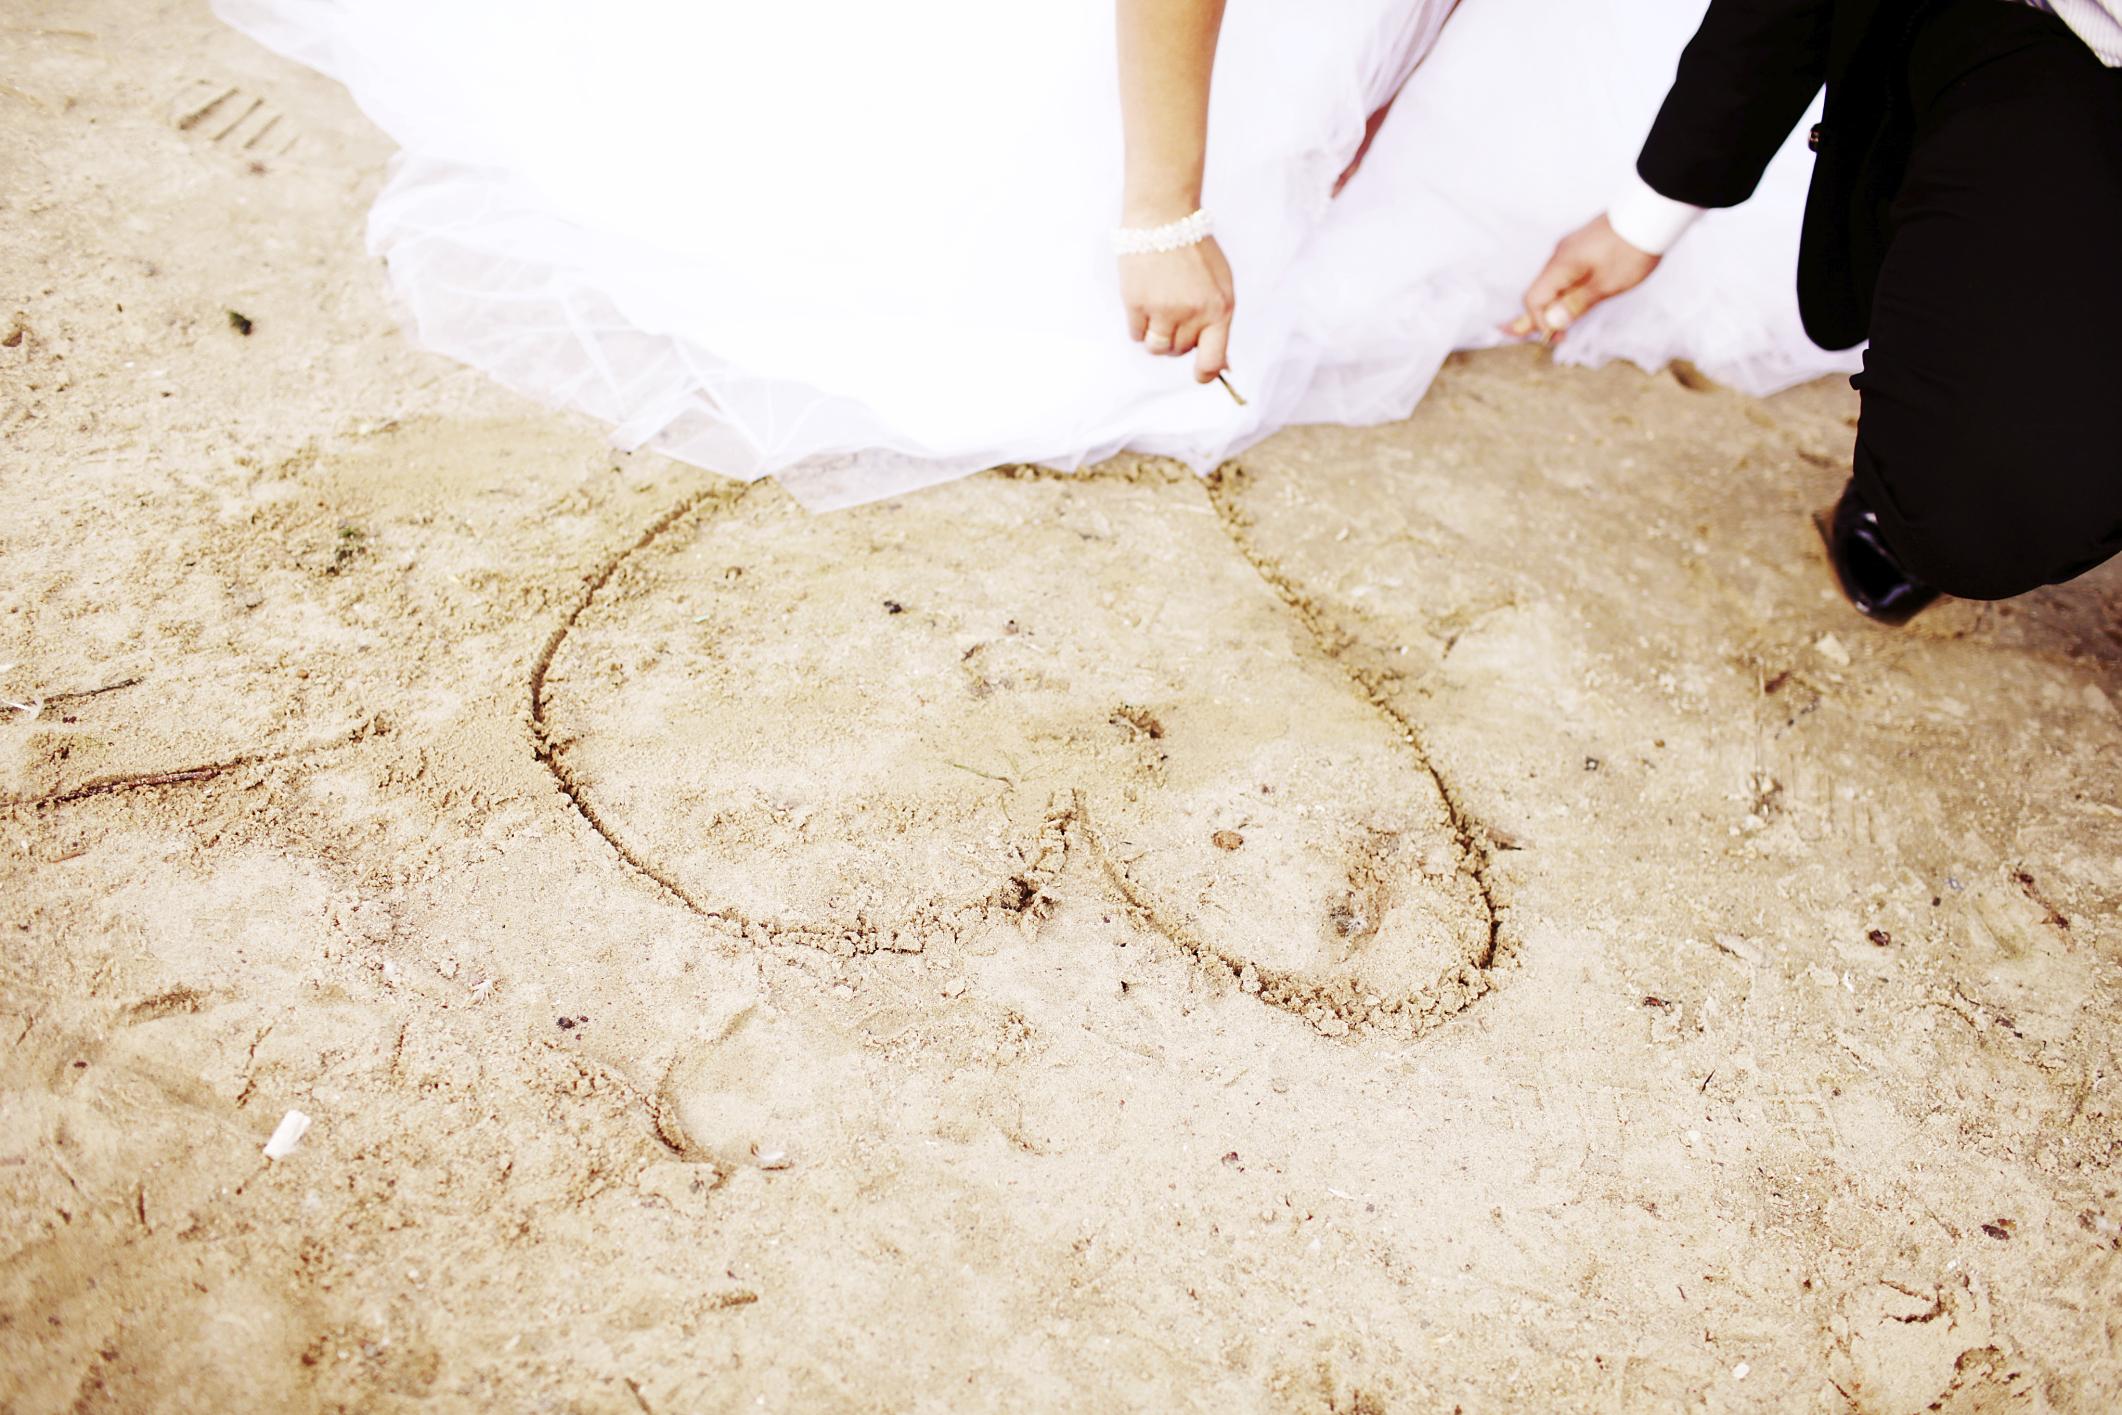 Destination wedding ideas - Articles - Easy Weddings